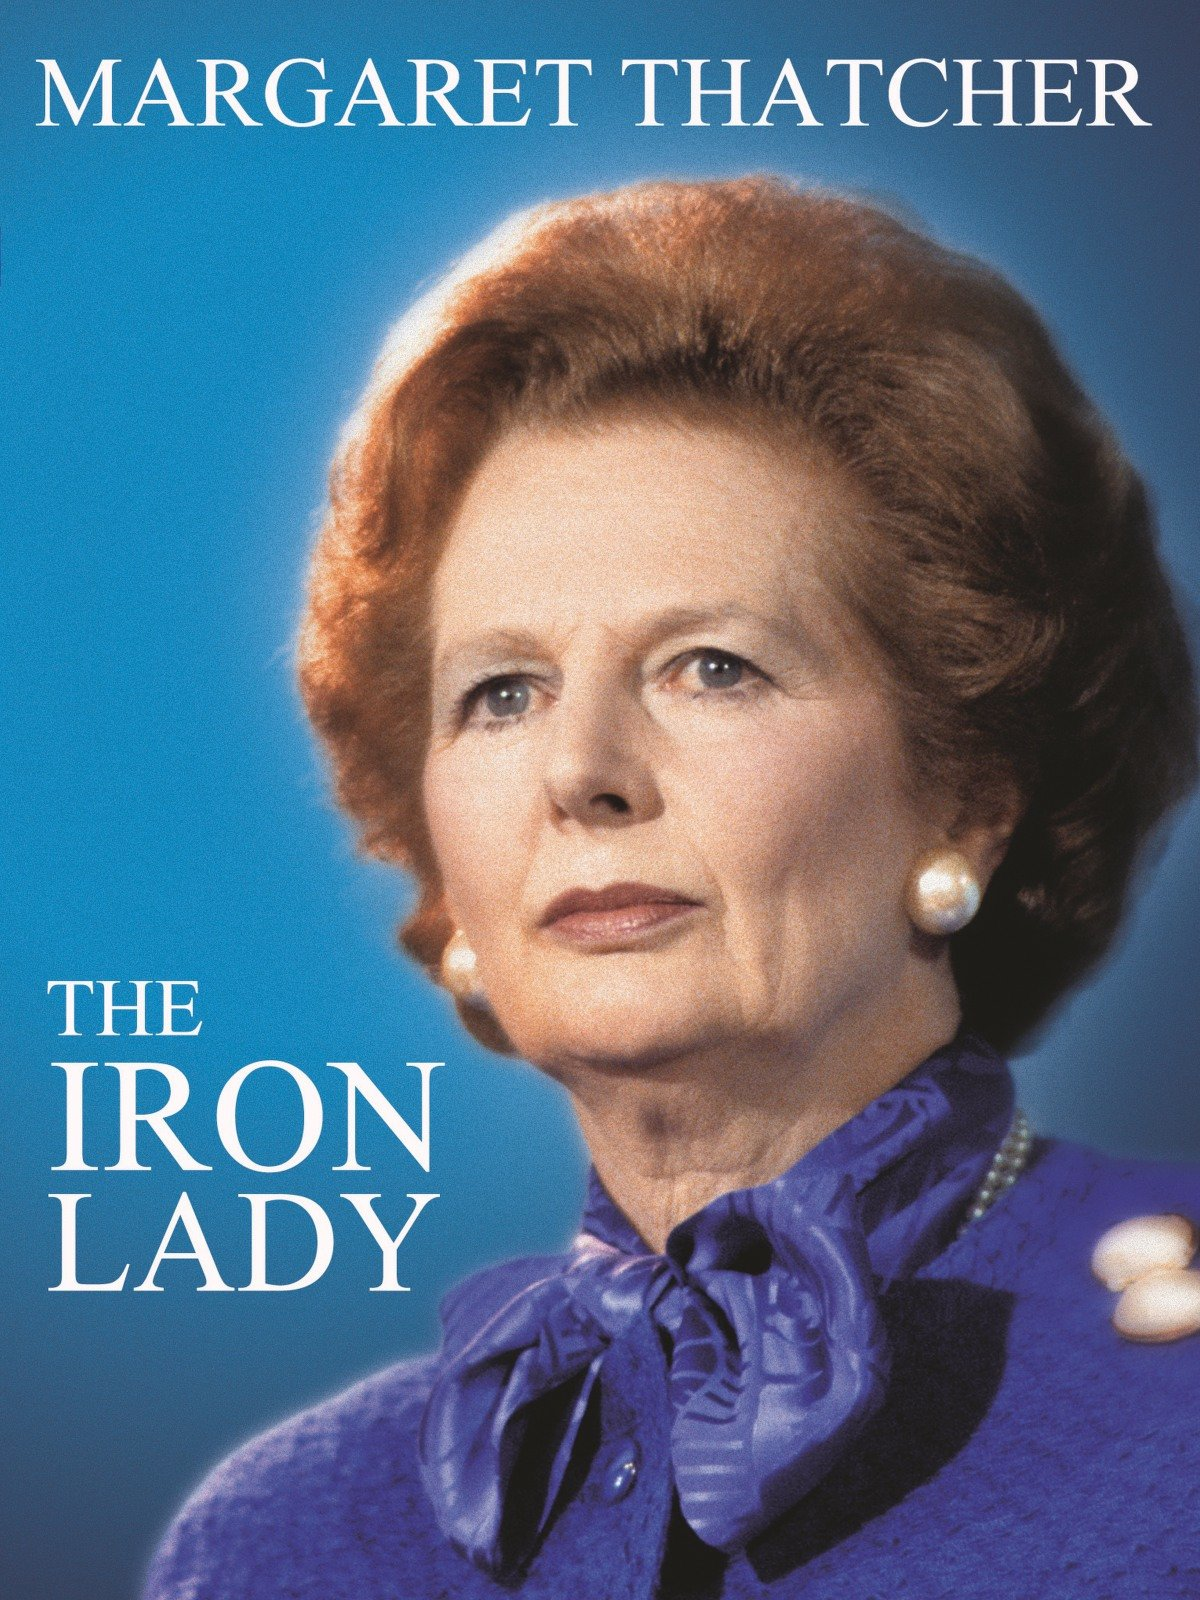 Margaret Thatcher - The Iron Lady